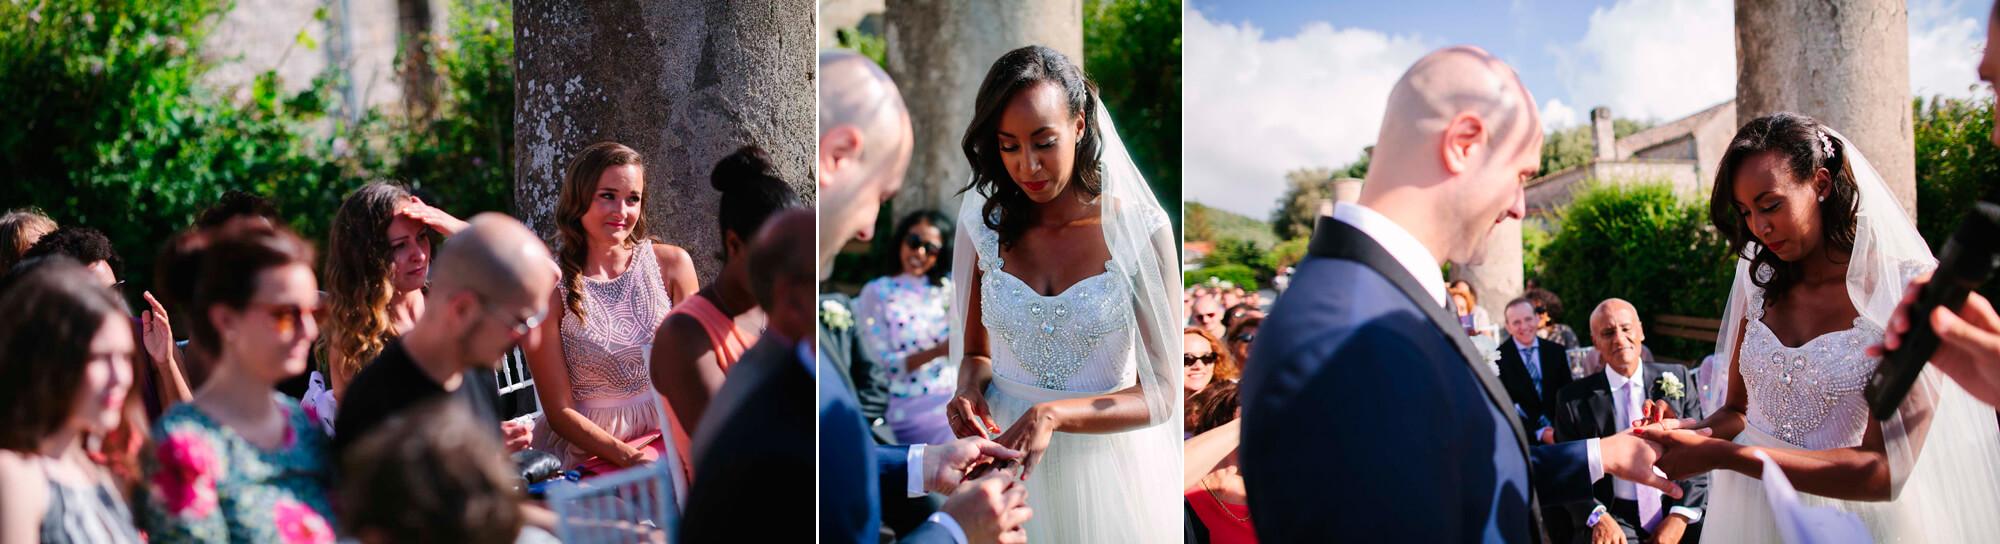 061-sorrento-wedding-photographer.jpg